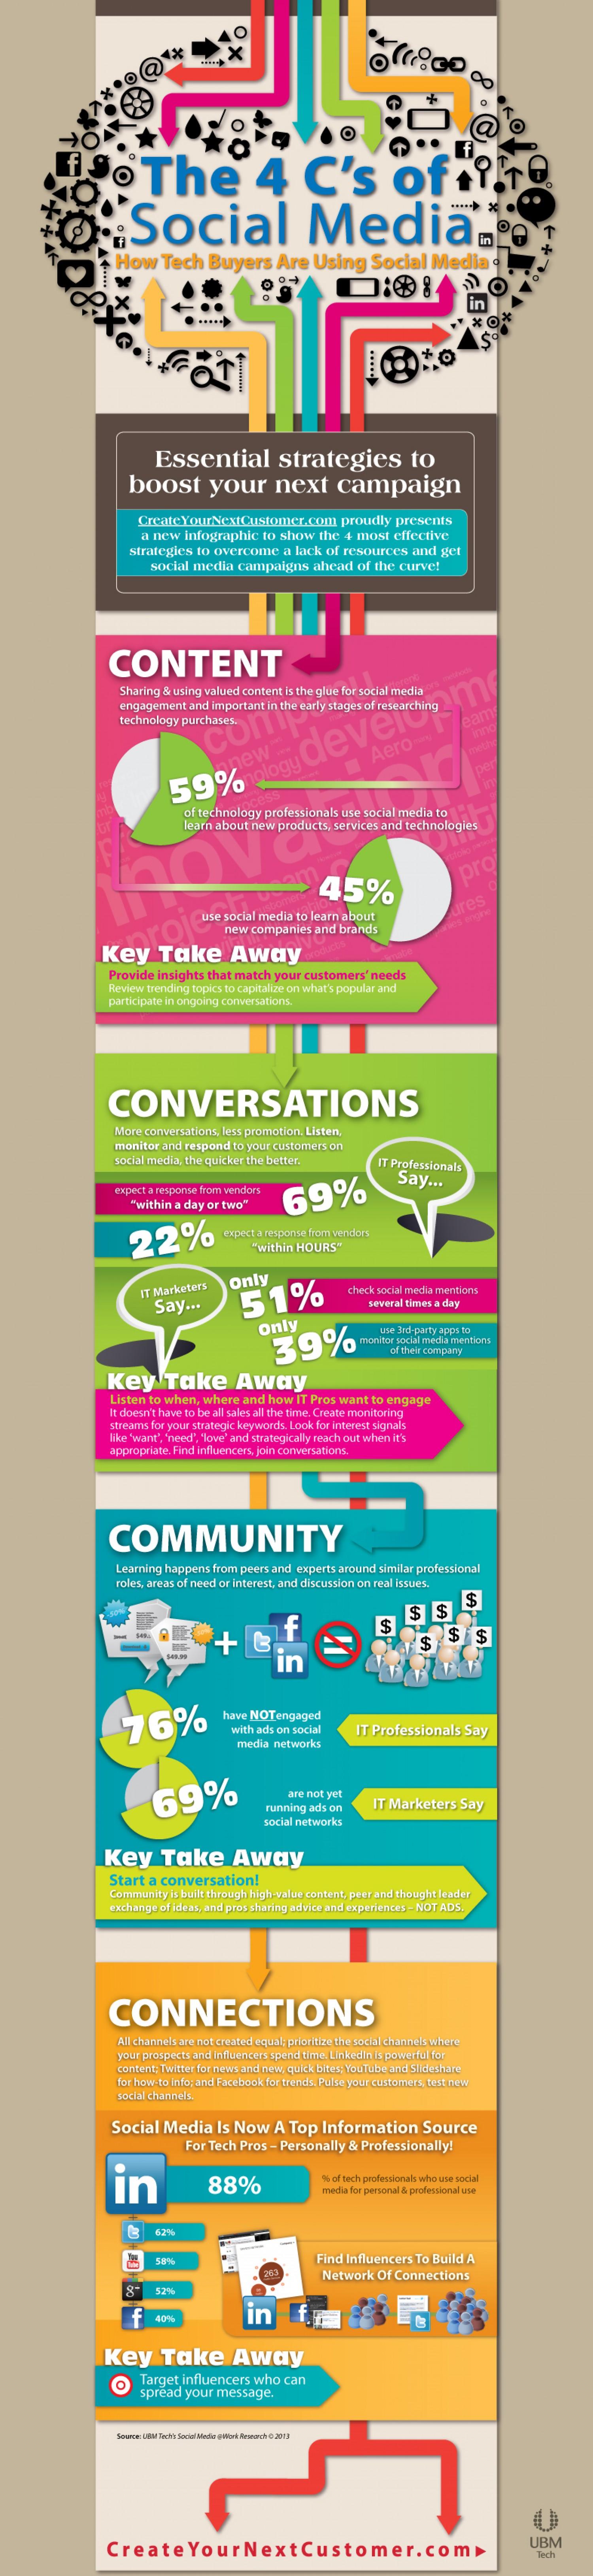 the-4-cs-of-social-media-infographic